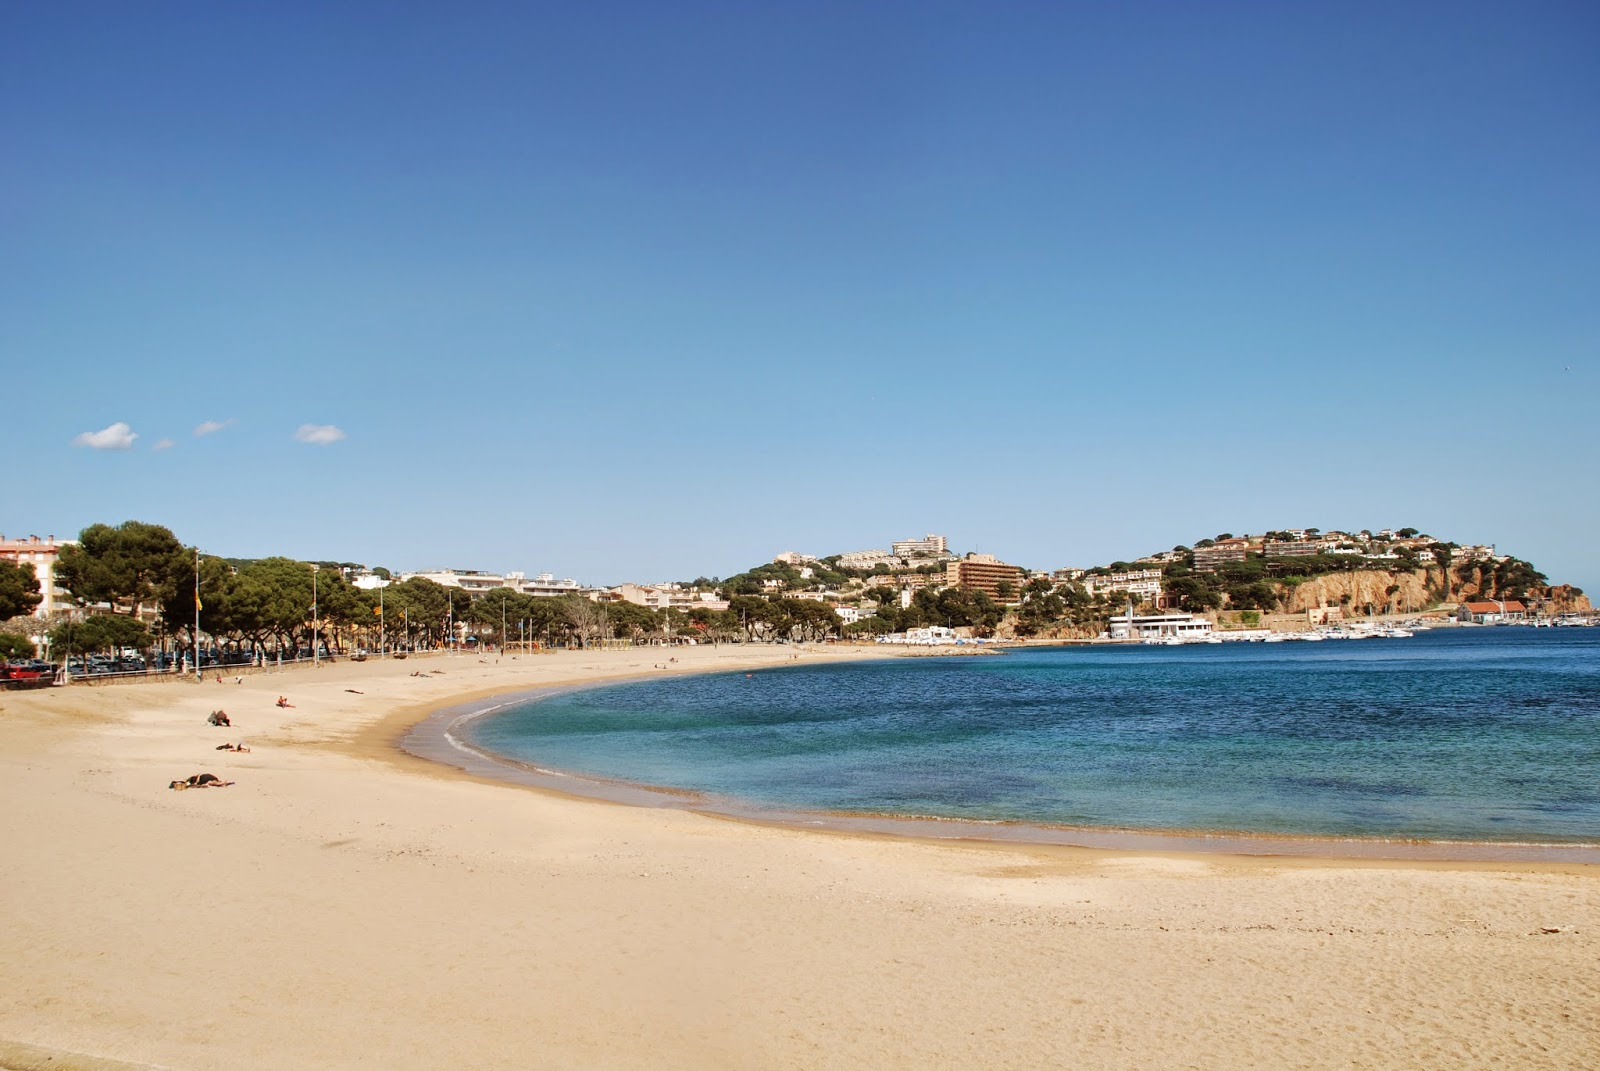 The beach, Sant Feliu de Guíxols, Catalonia